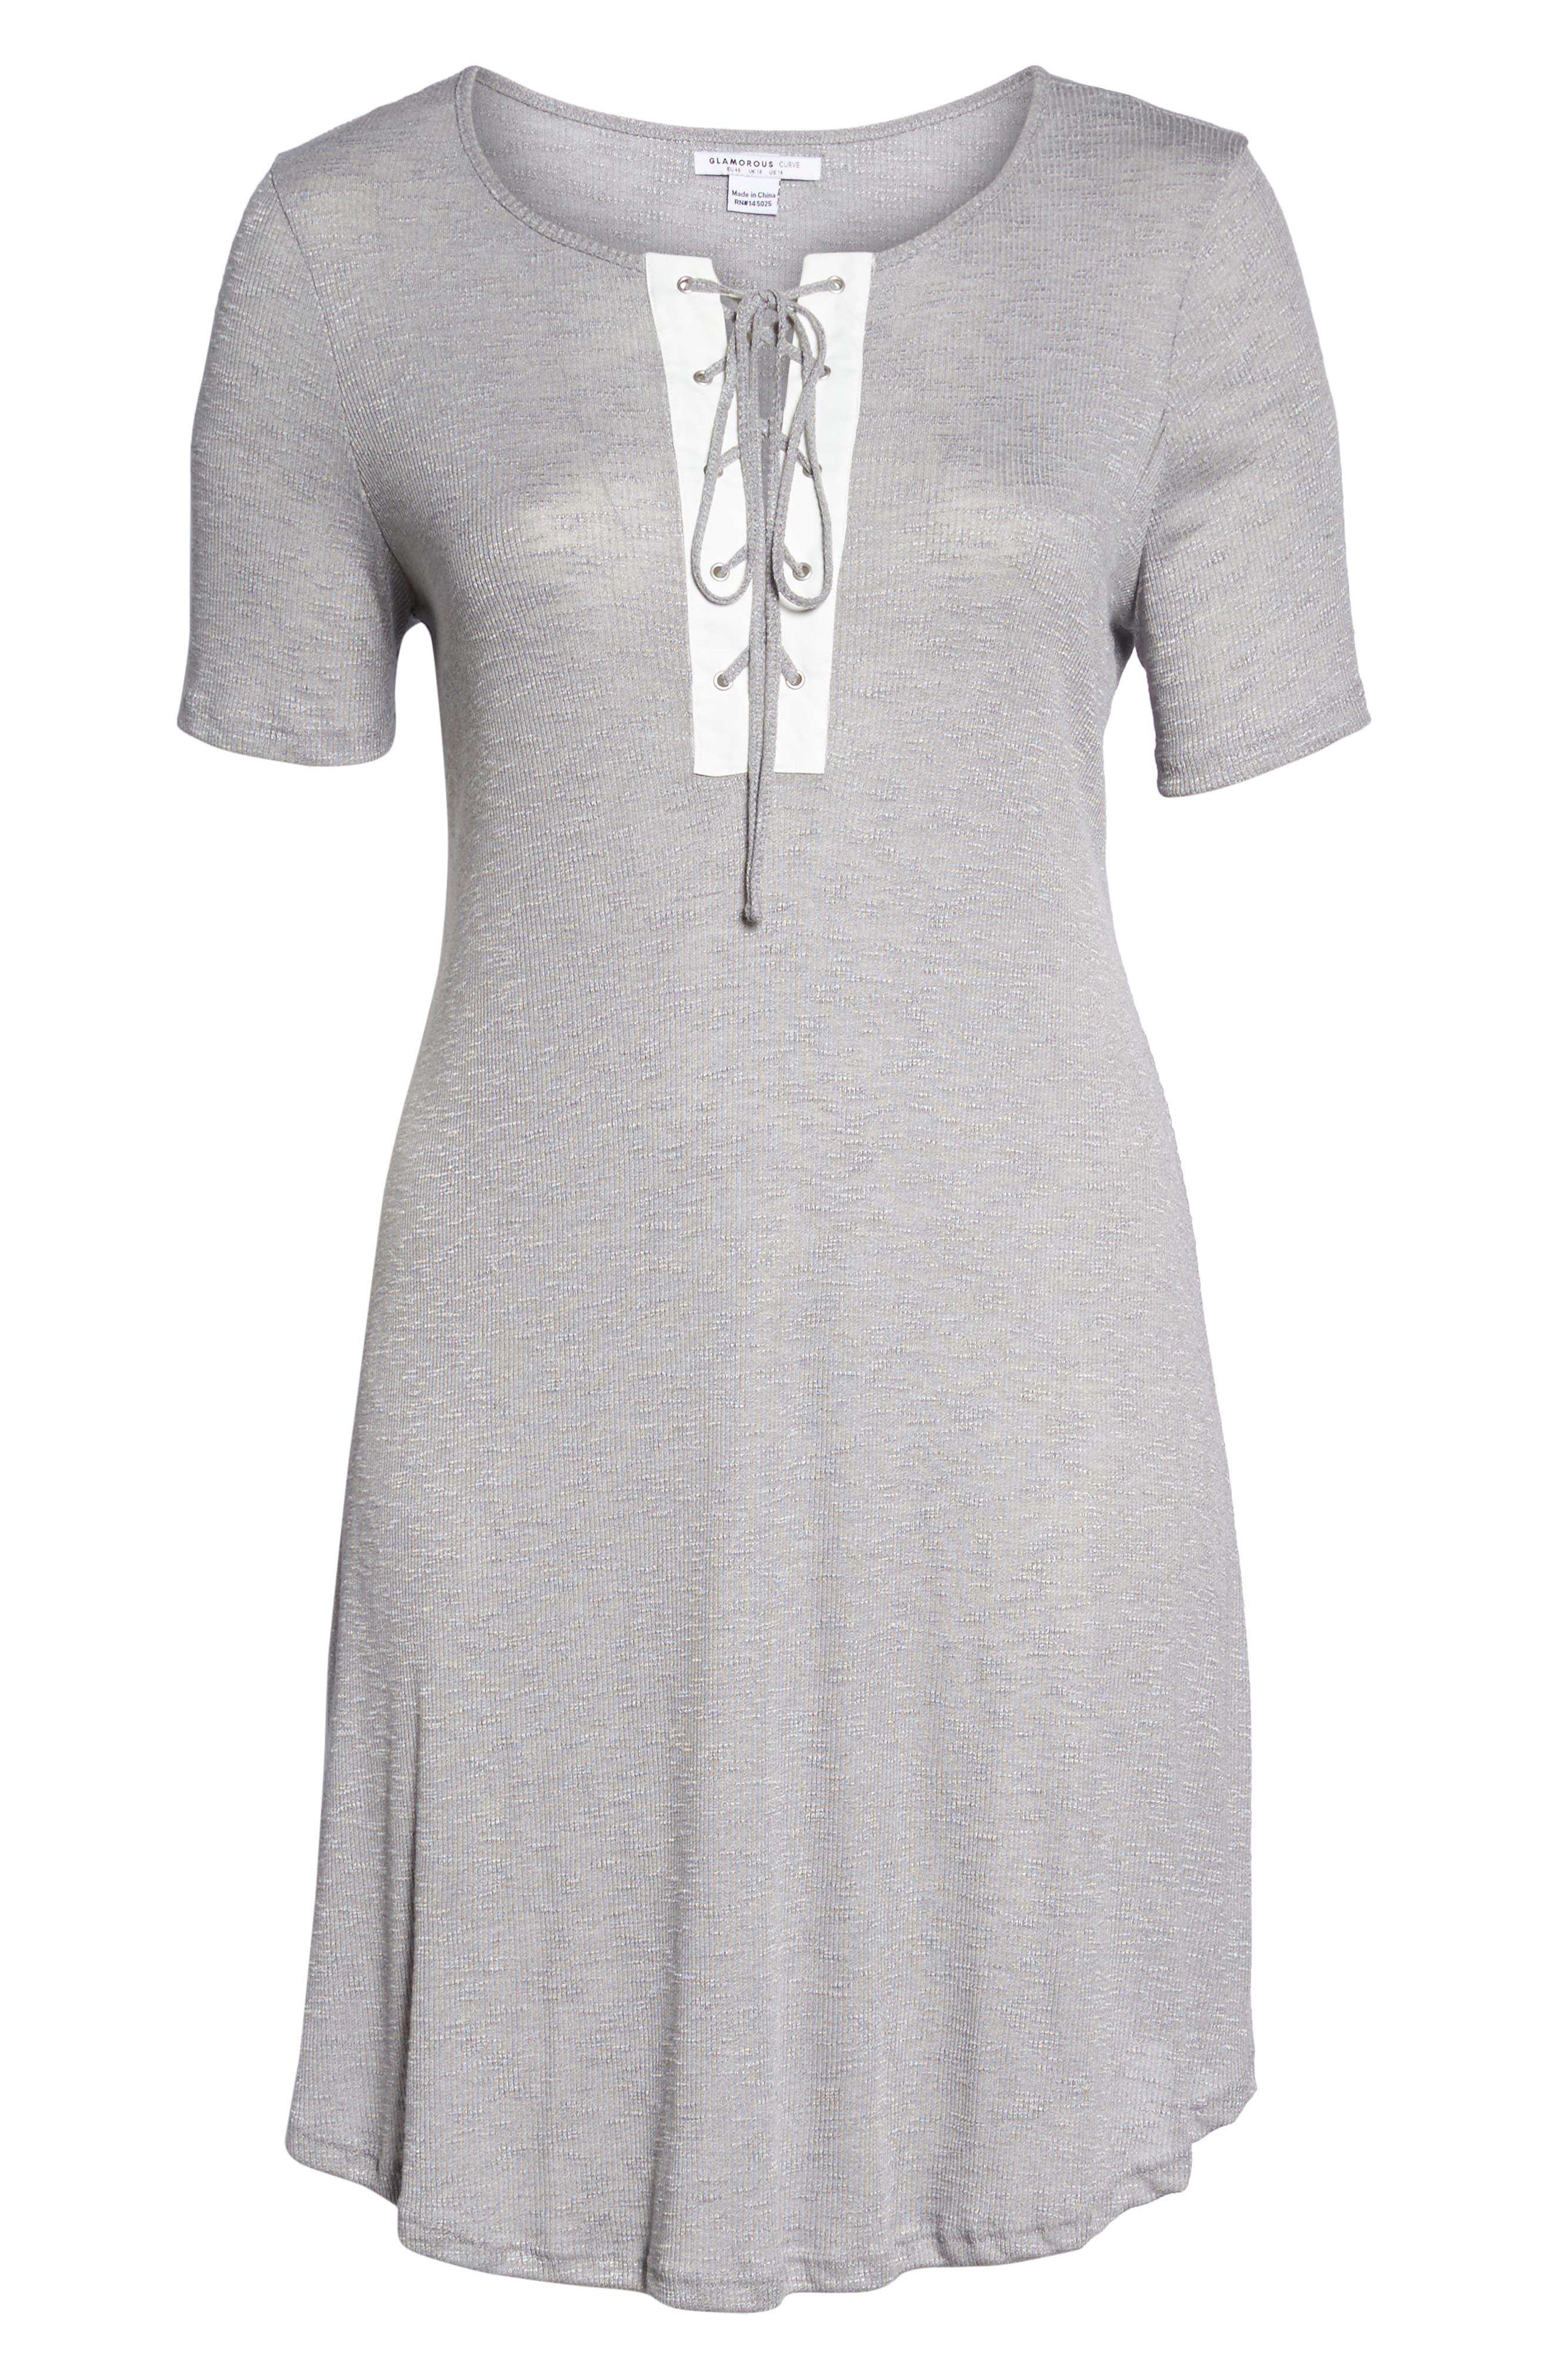 Lace-Up Knit Shift Dress,                             Alternate thumbnail 6, color,                             020